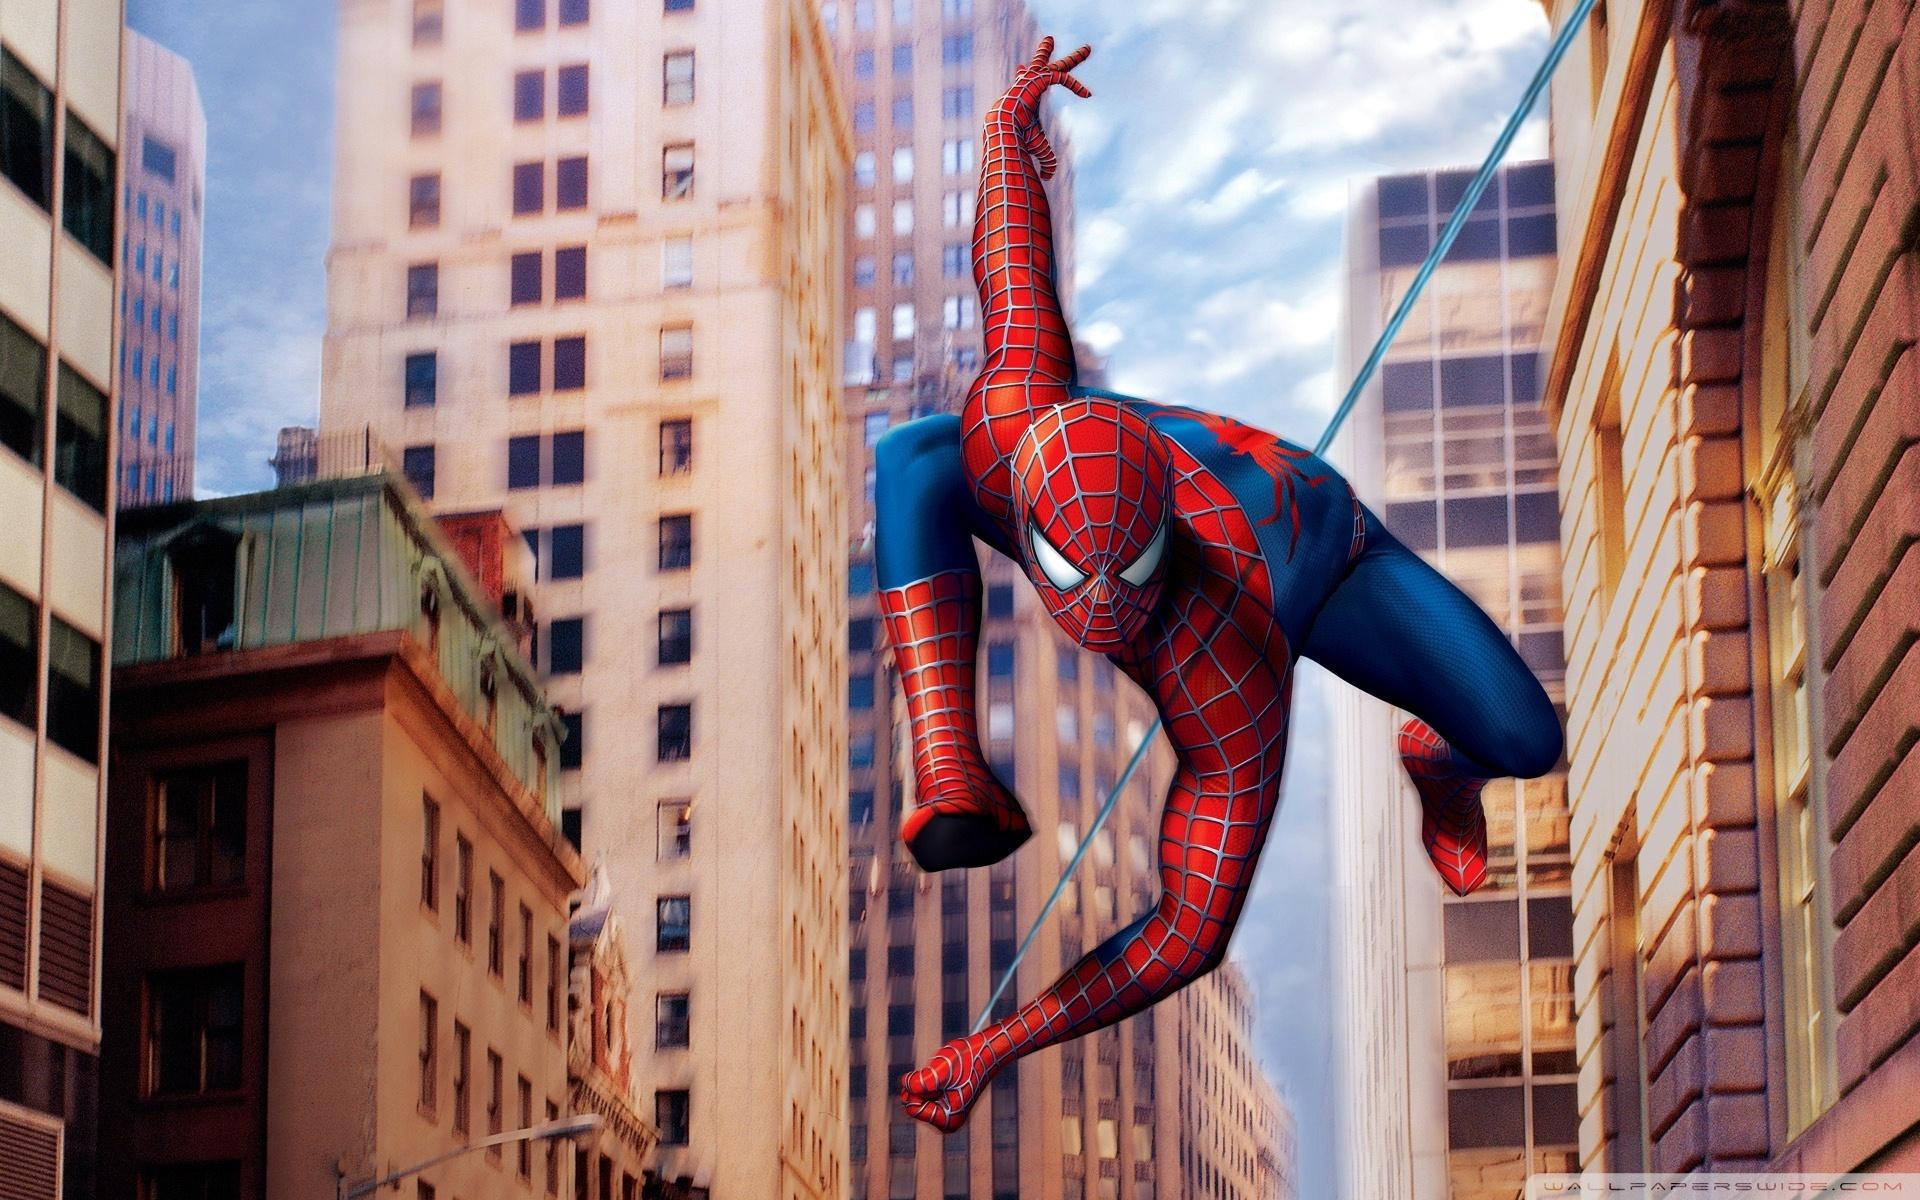 Amazing Wallpaper Marvel Full Hd - spiderman_marvel-wallpaper-1920x1200  Graphic_362613.jpg